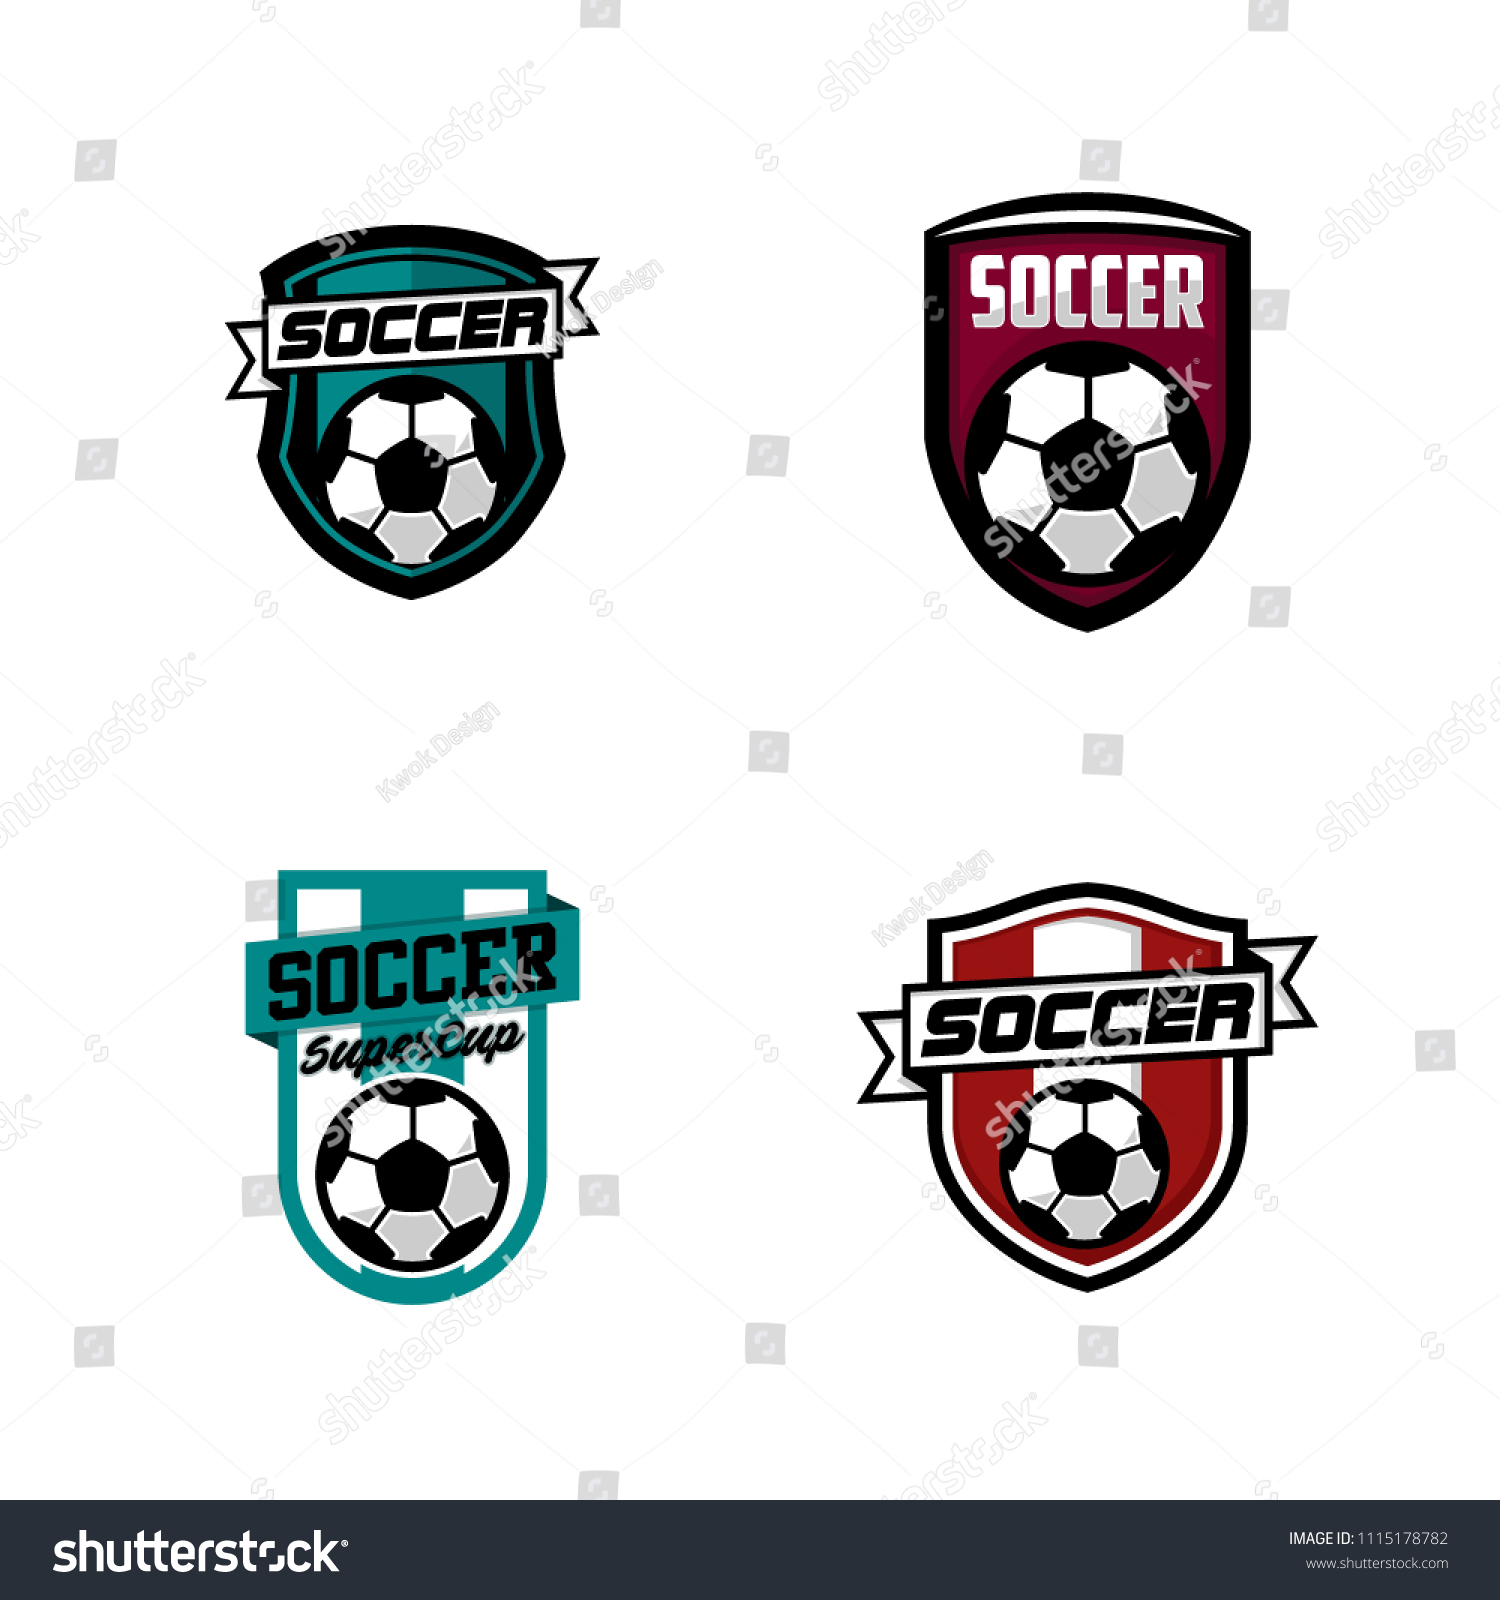 Set Of Soccer Or Football Club Emblem Logo Badge Design Sport Team Vector Illustration Template